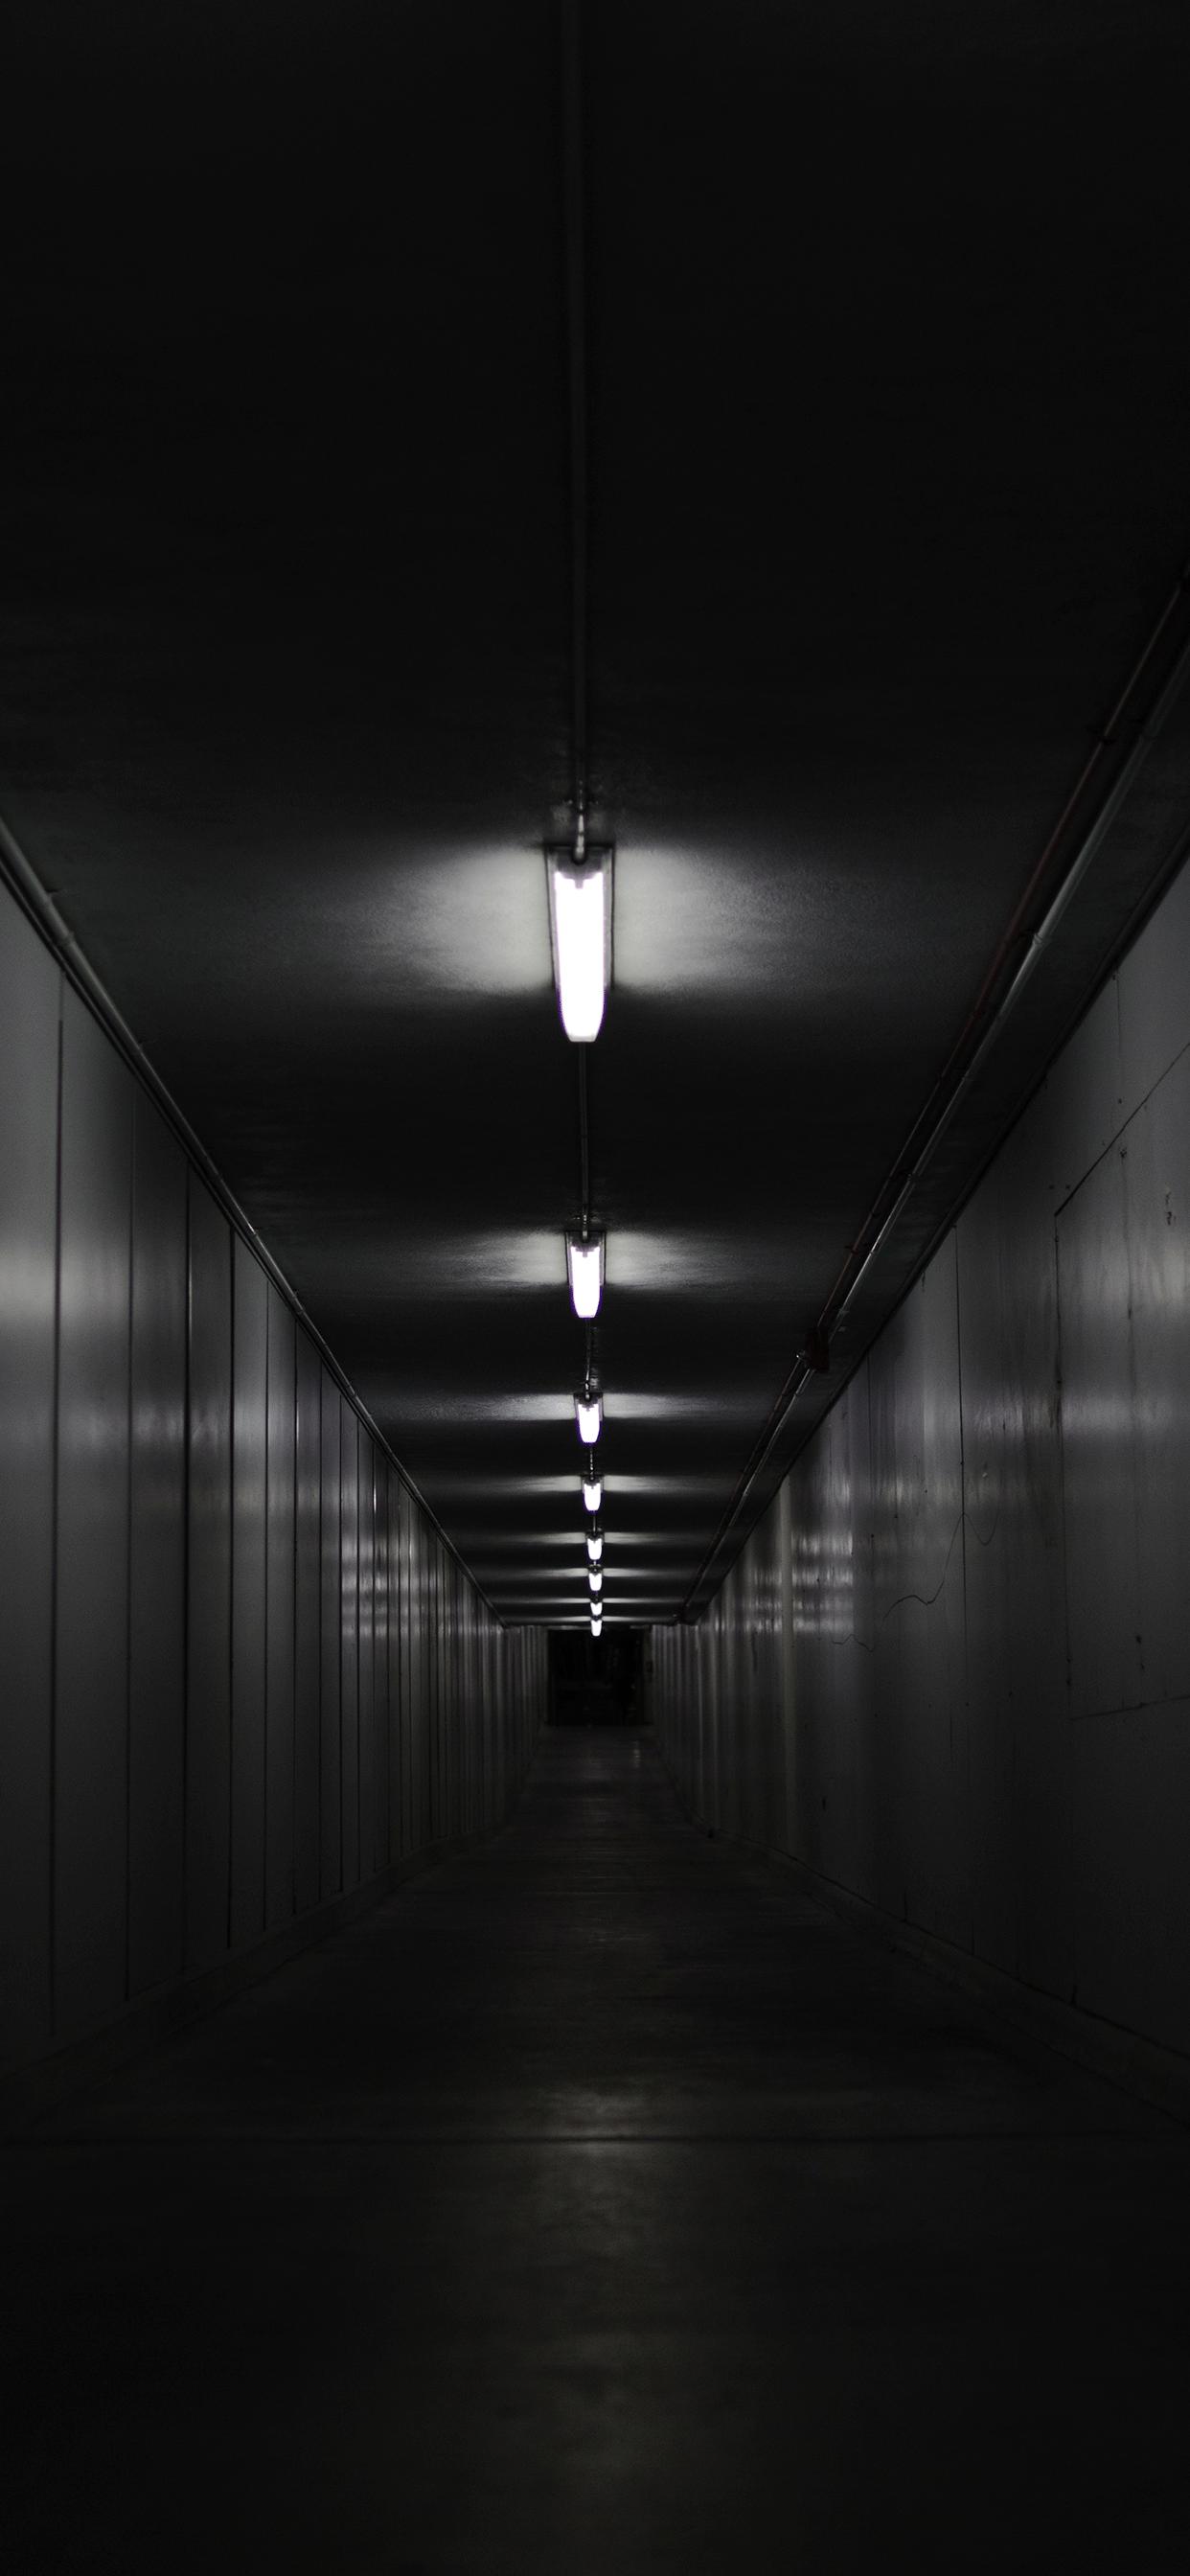 iPhone Dark Wallpapers - Wallpaper Cave